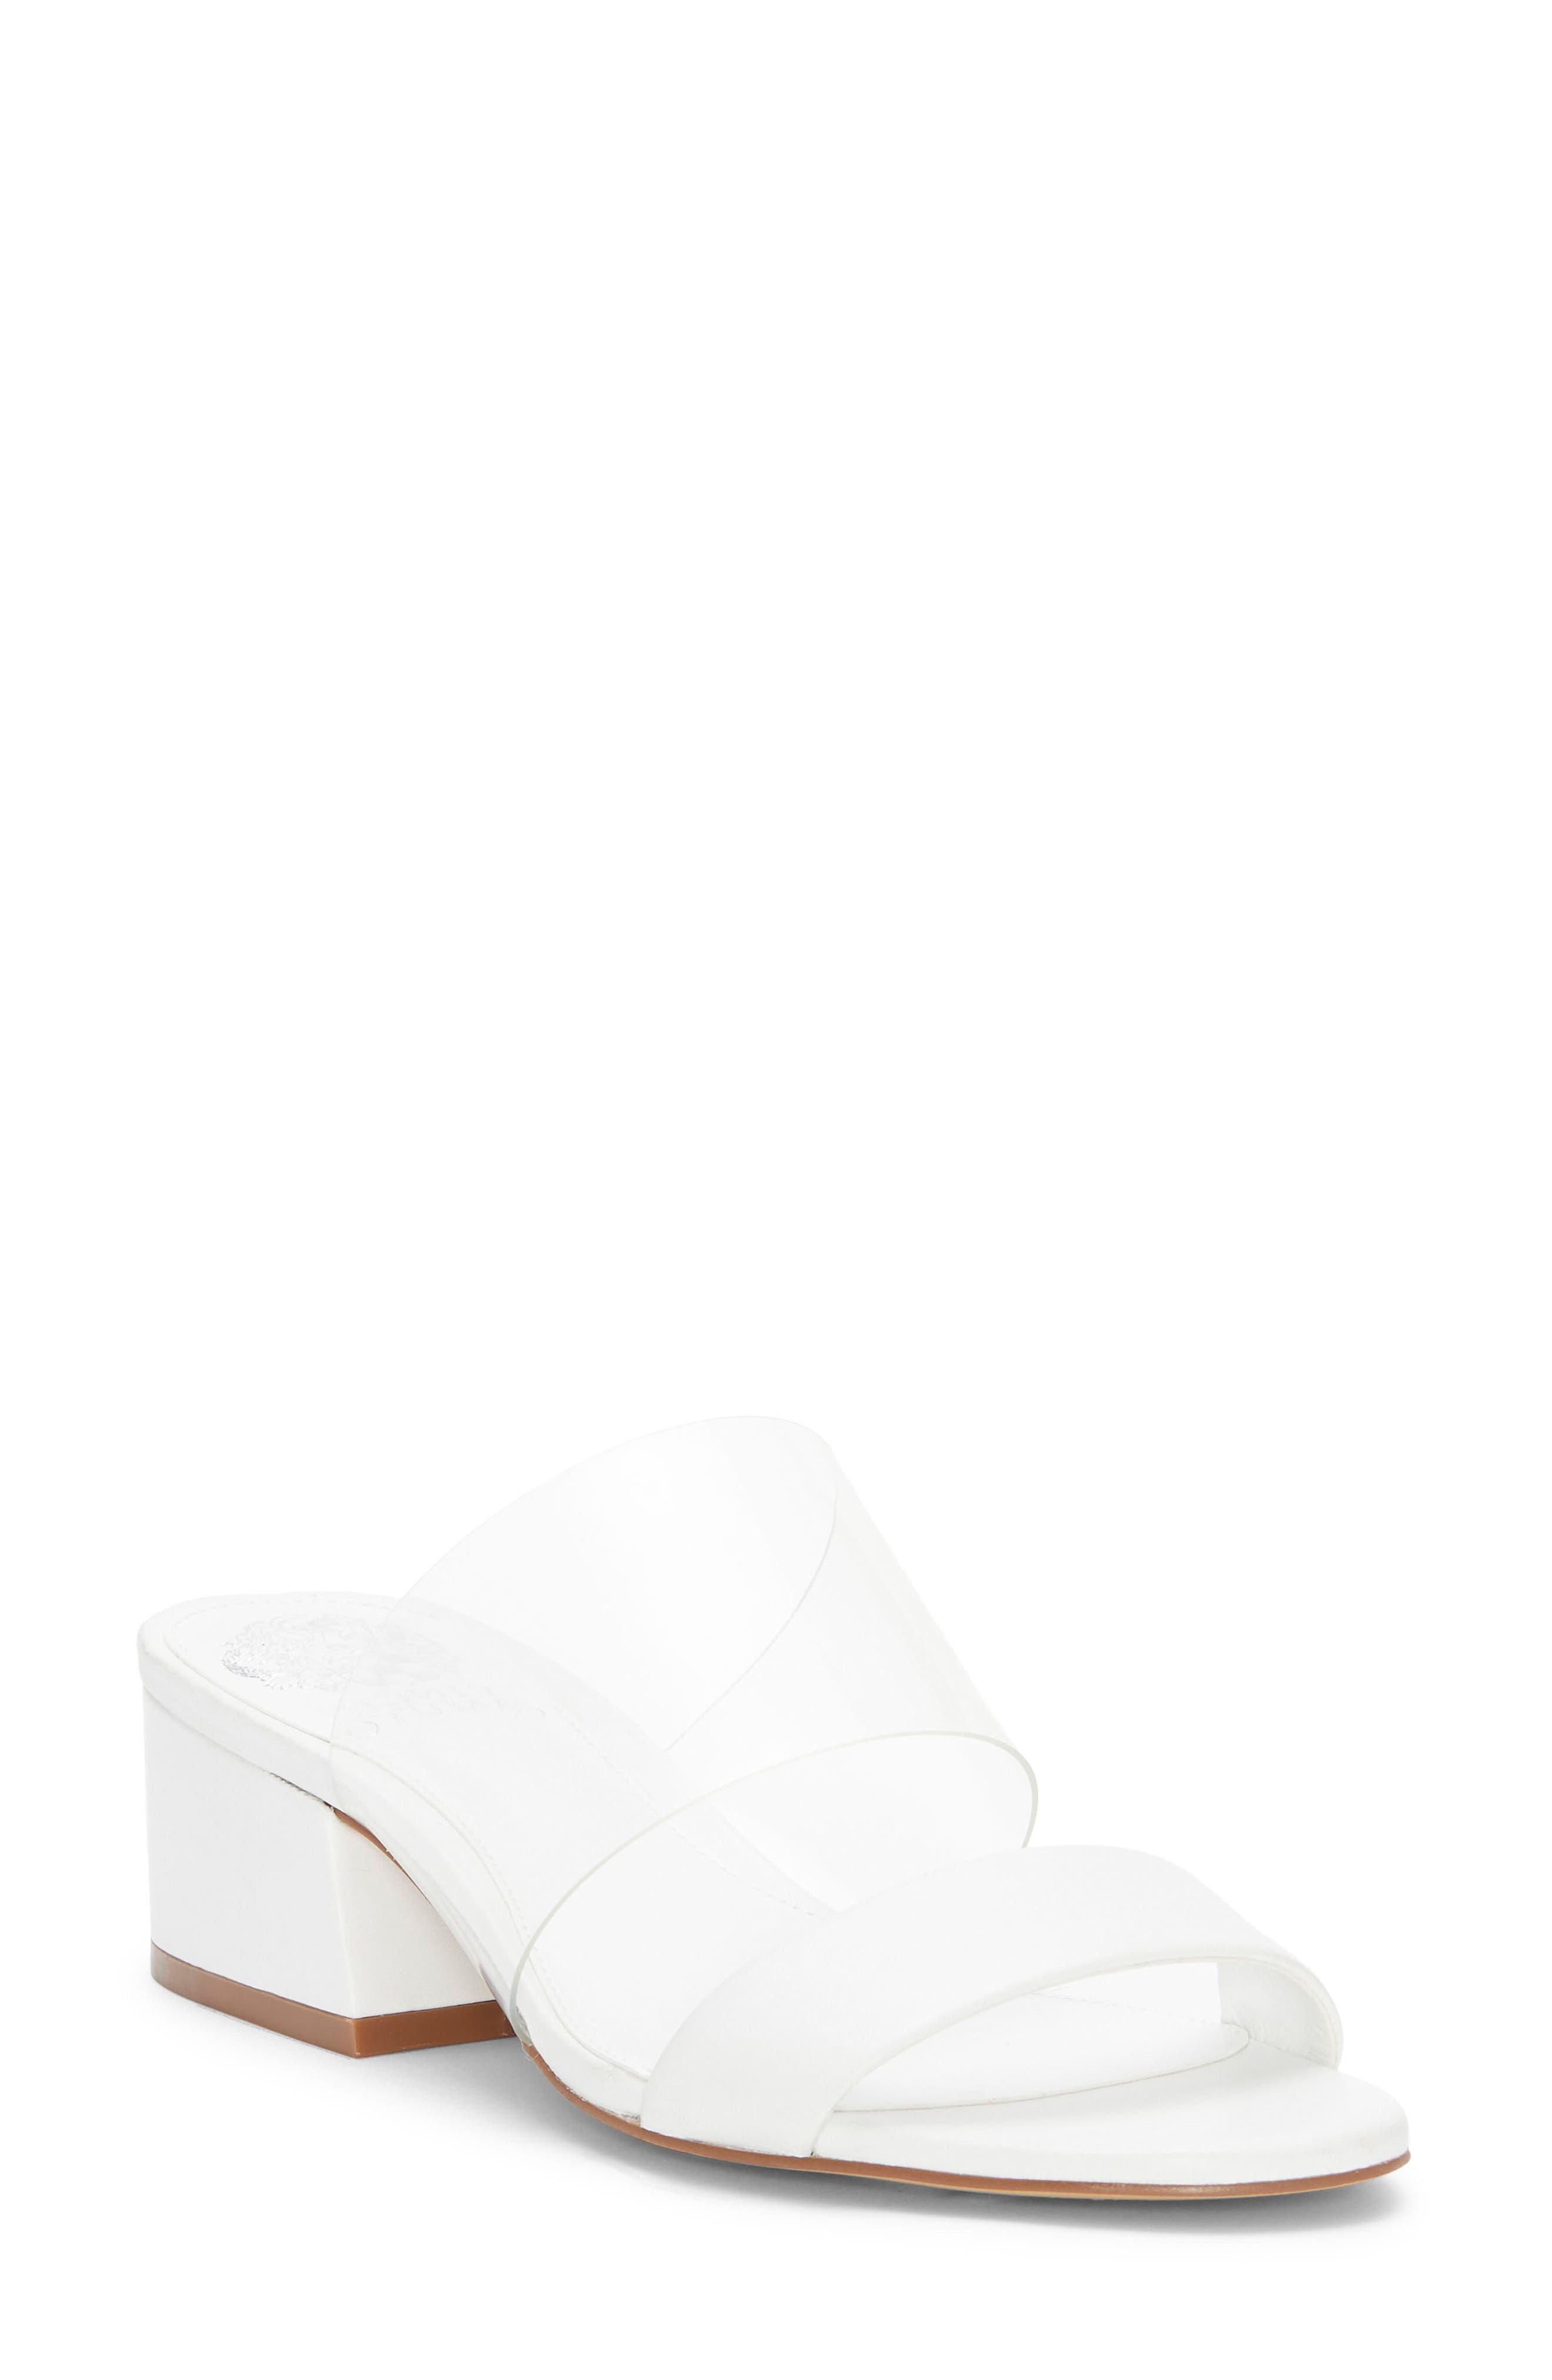 Vince Camuto Caveera Slide Sandal- White